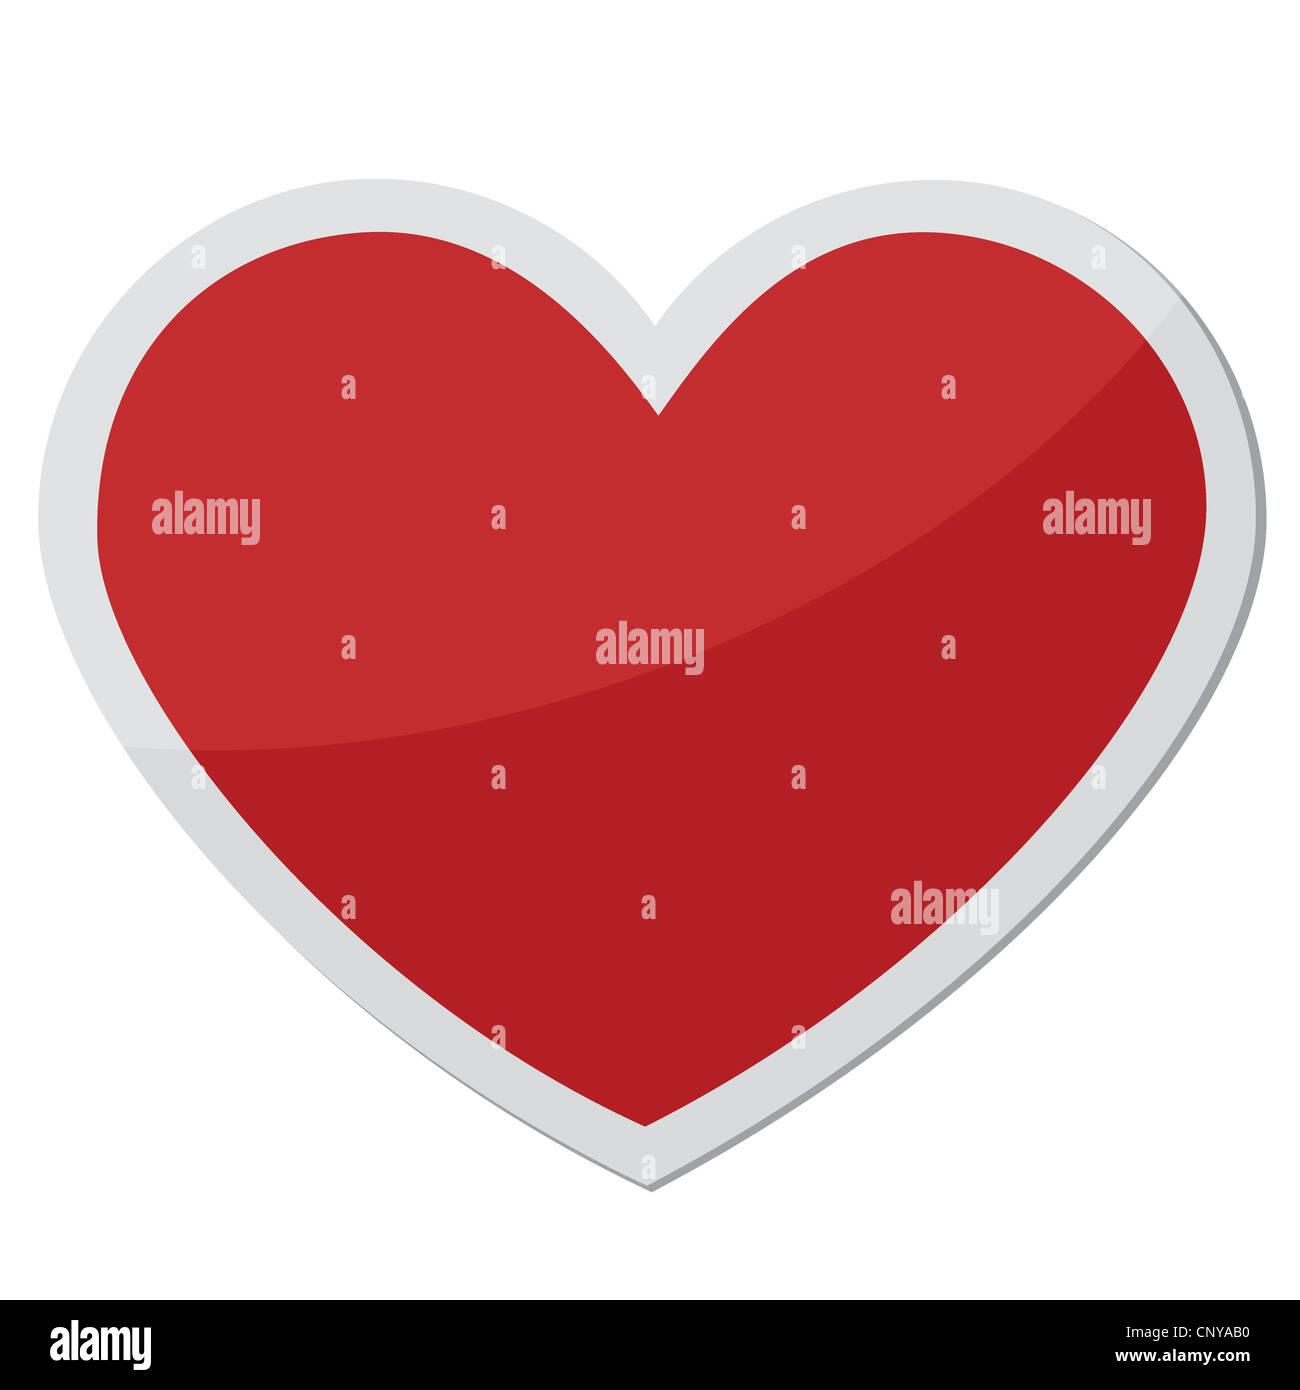 Heart Shape Design For Love Symbols Stock Photo 47929364 Alamy